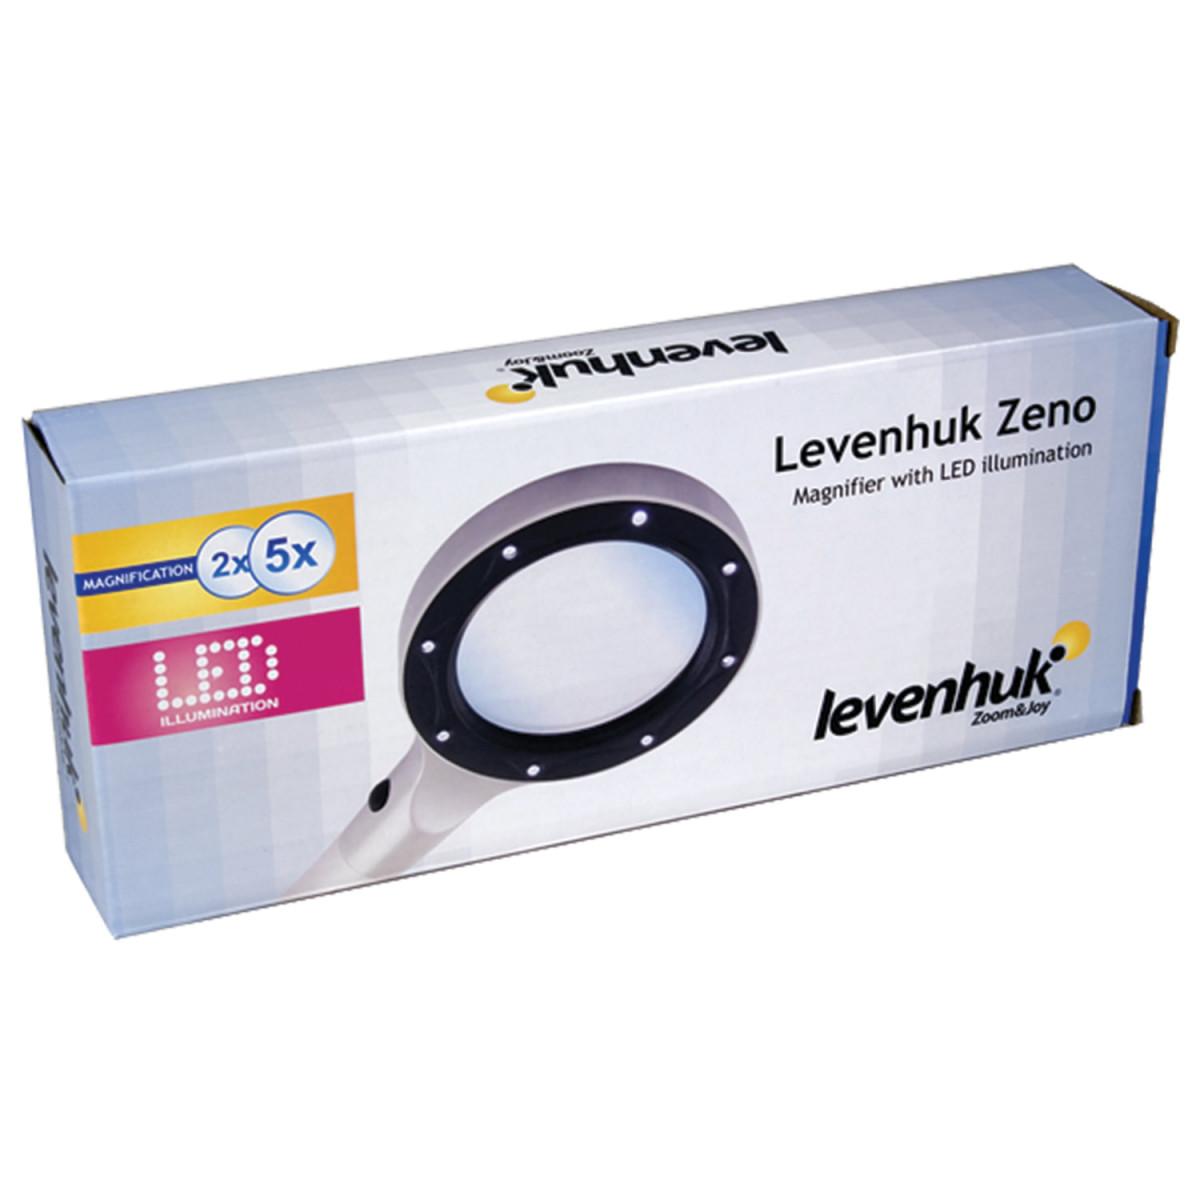 Лупа LEVENHUK Zeno 50, увеличение х2,2/х4,4, диаметр линз 88/21 мм, подсветка, пластик, 38114 (арт. 38114)